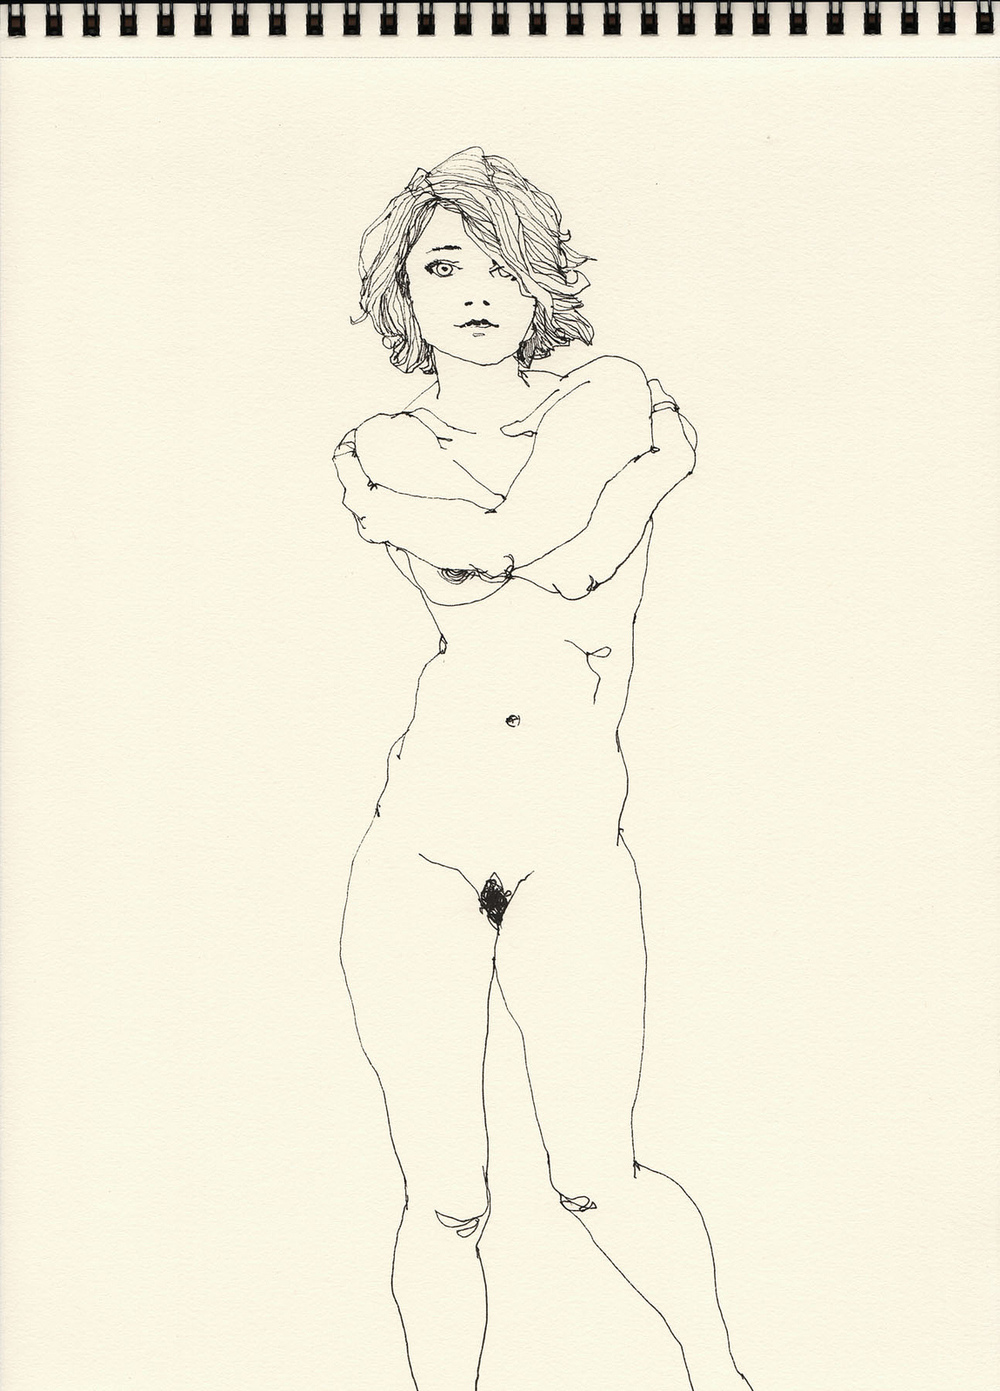 the-tree-mag-drawings-by-lu-cong-210.jpg